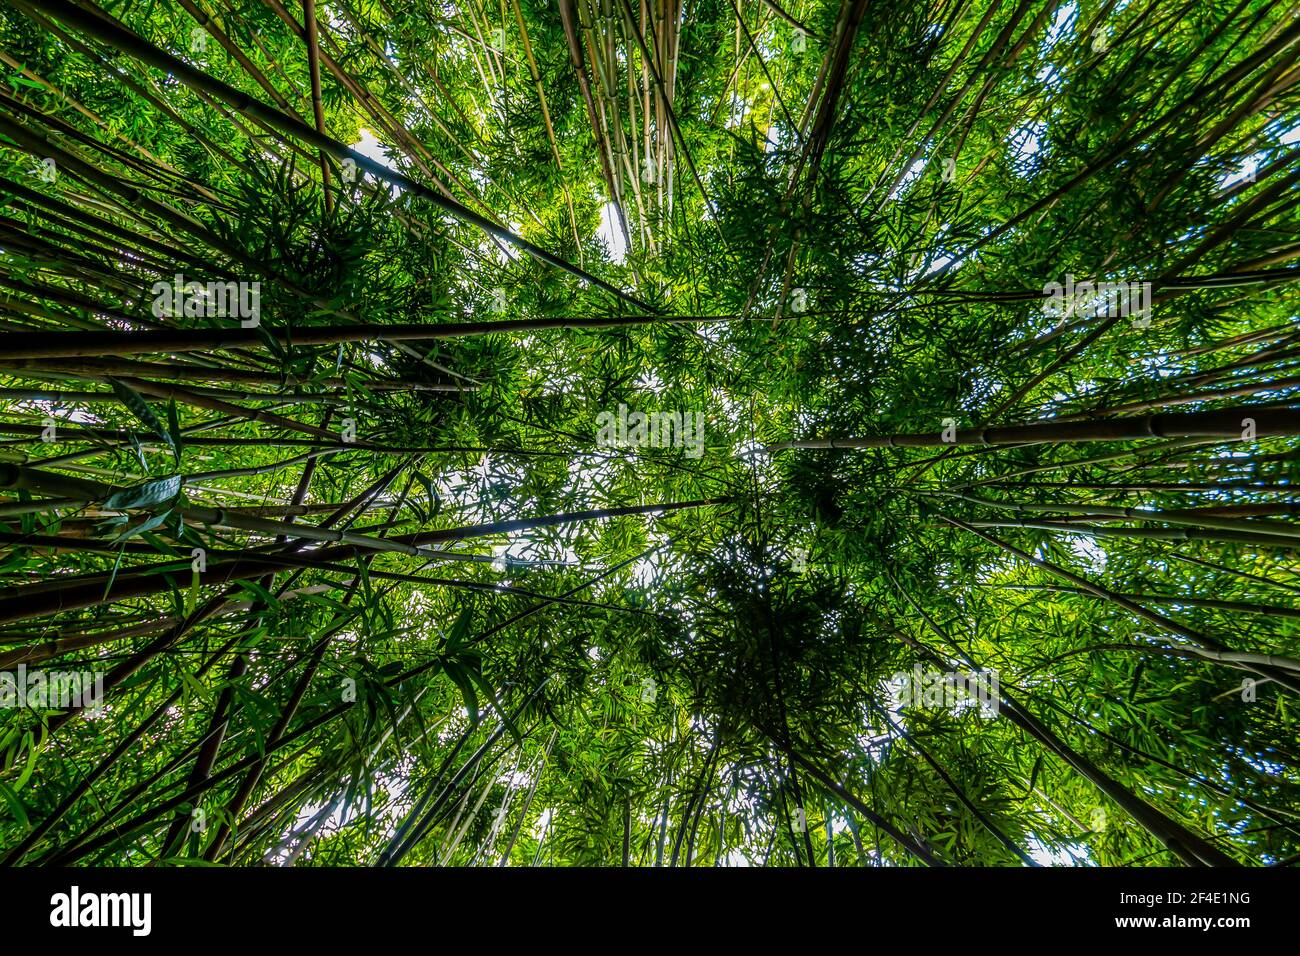 Vertical View of Giant Bamboo Forest on The Pipiwai Trail, Kipahulu District, Haleakal National Park, Maui, Hawaii, USA Stock Photo